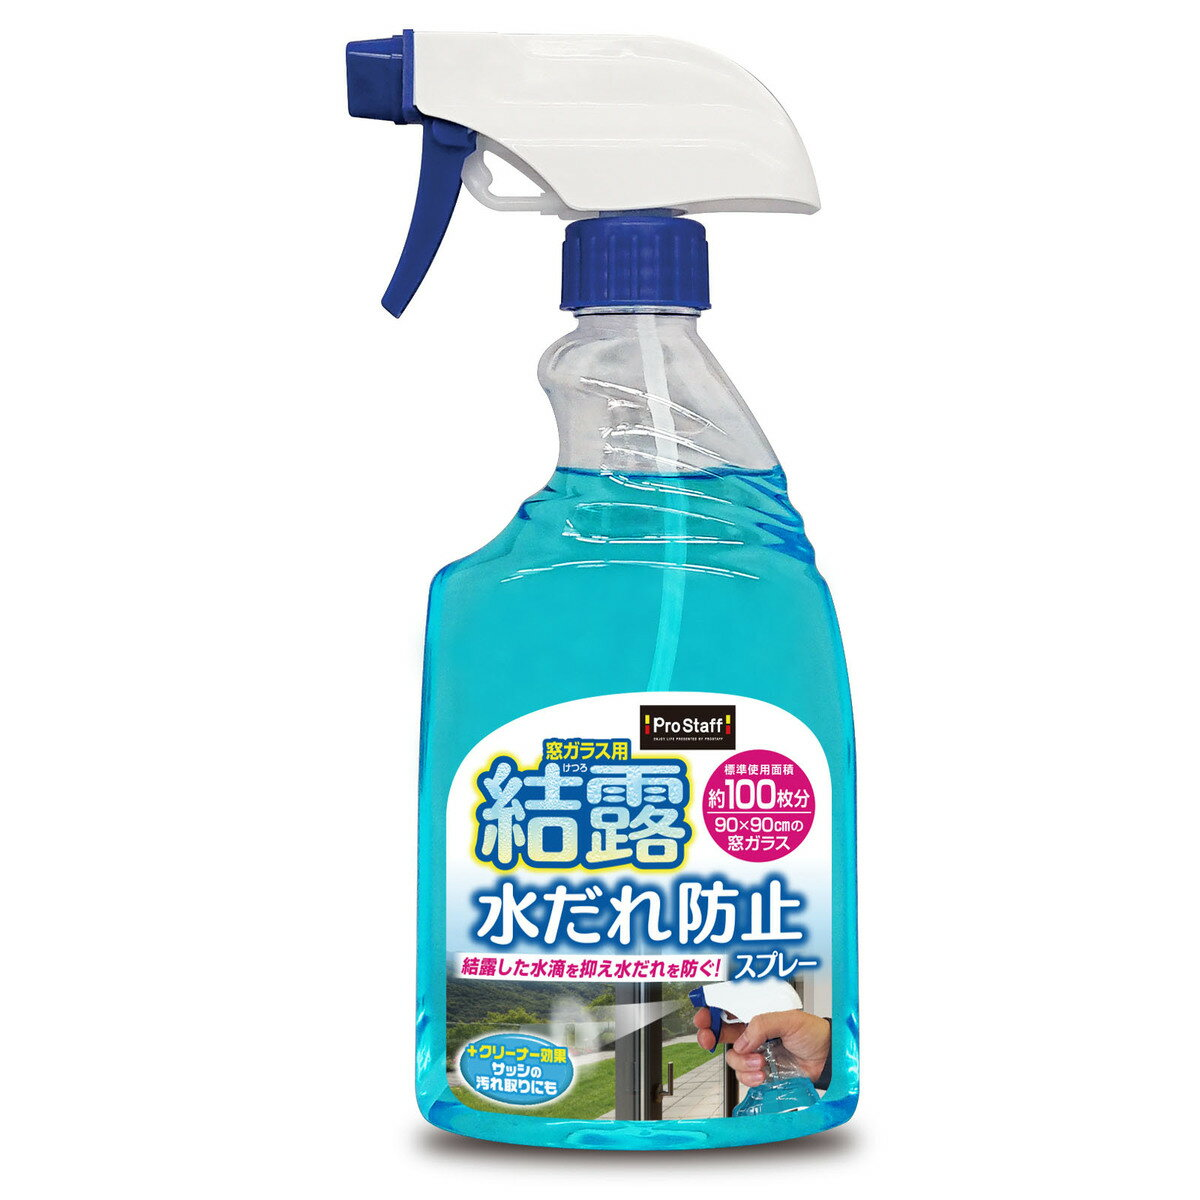 PROSTAFF『窓ガラス用結露水だれ防止スプレー』